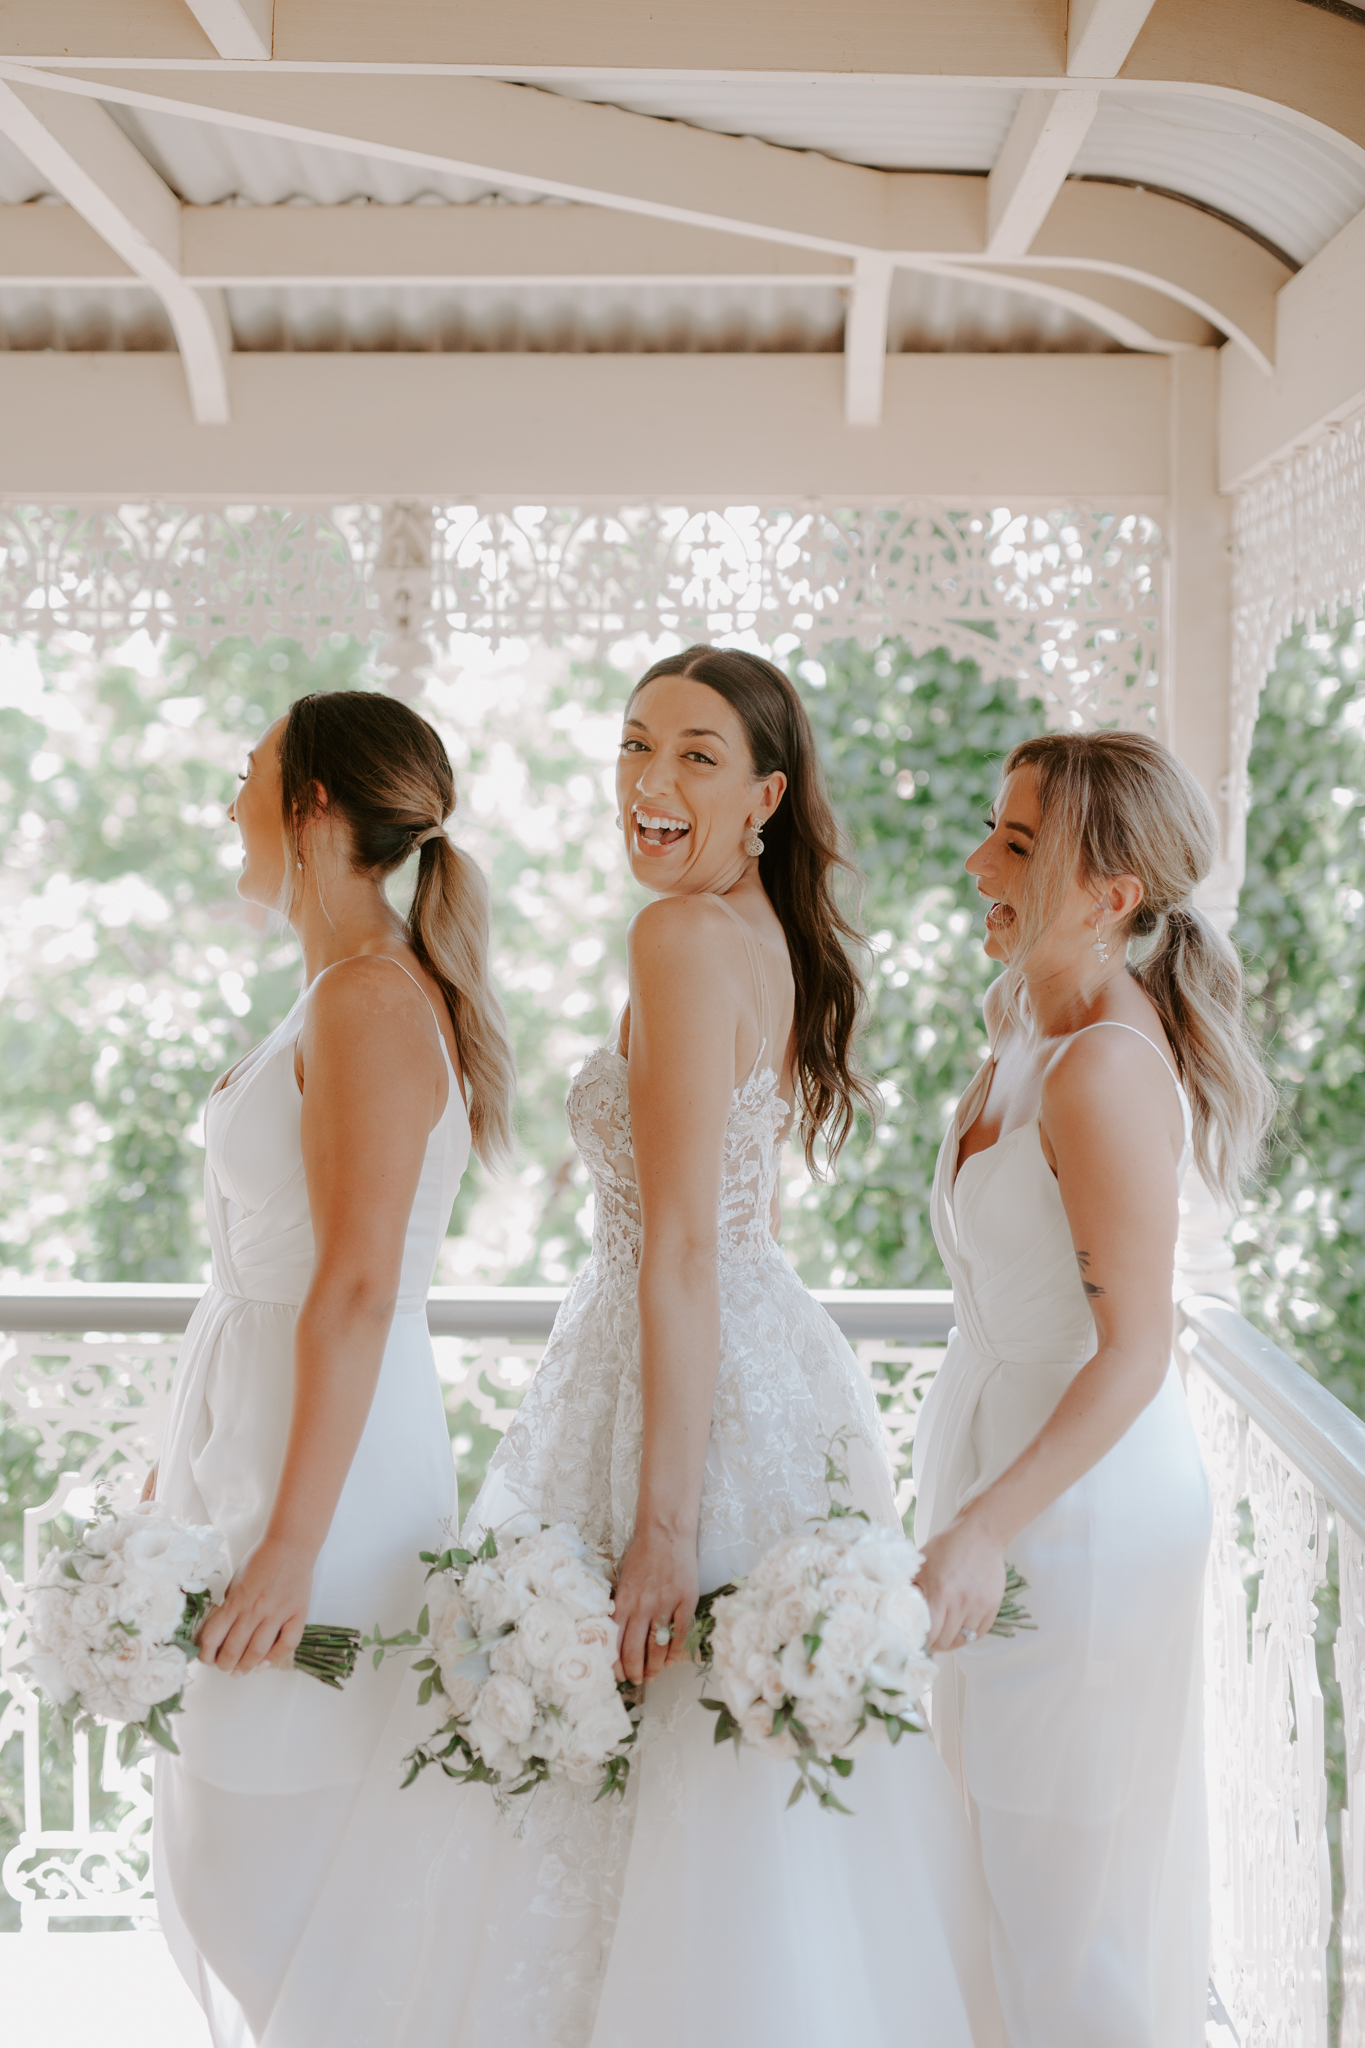 The-Stones-of-Yarra-Valley-Wedding-EmotionsandMathPhotography-040.jpg